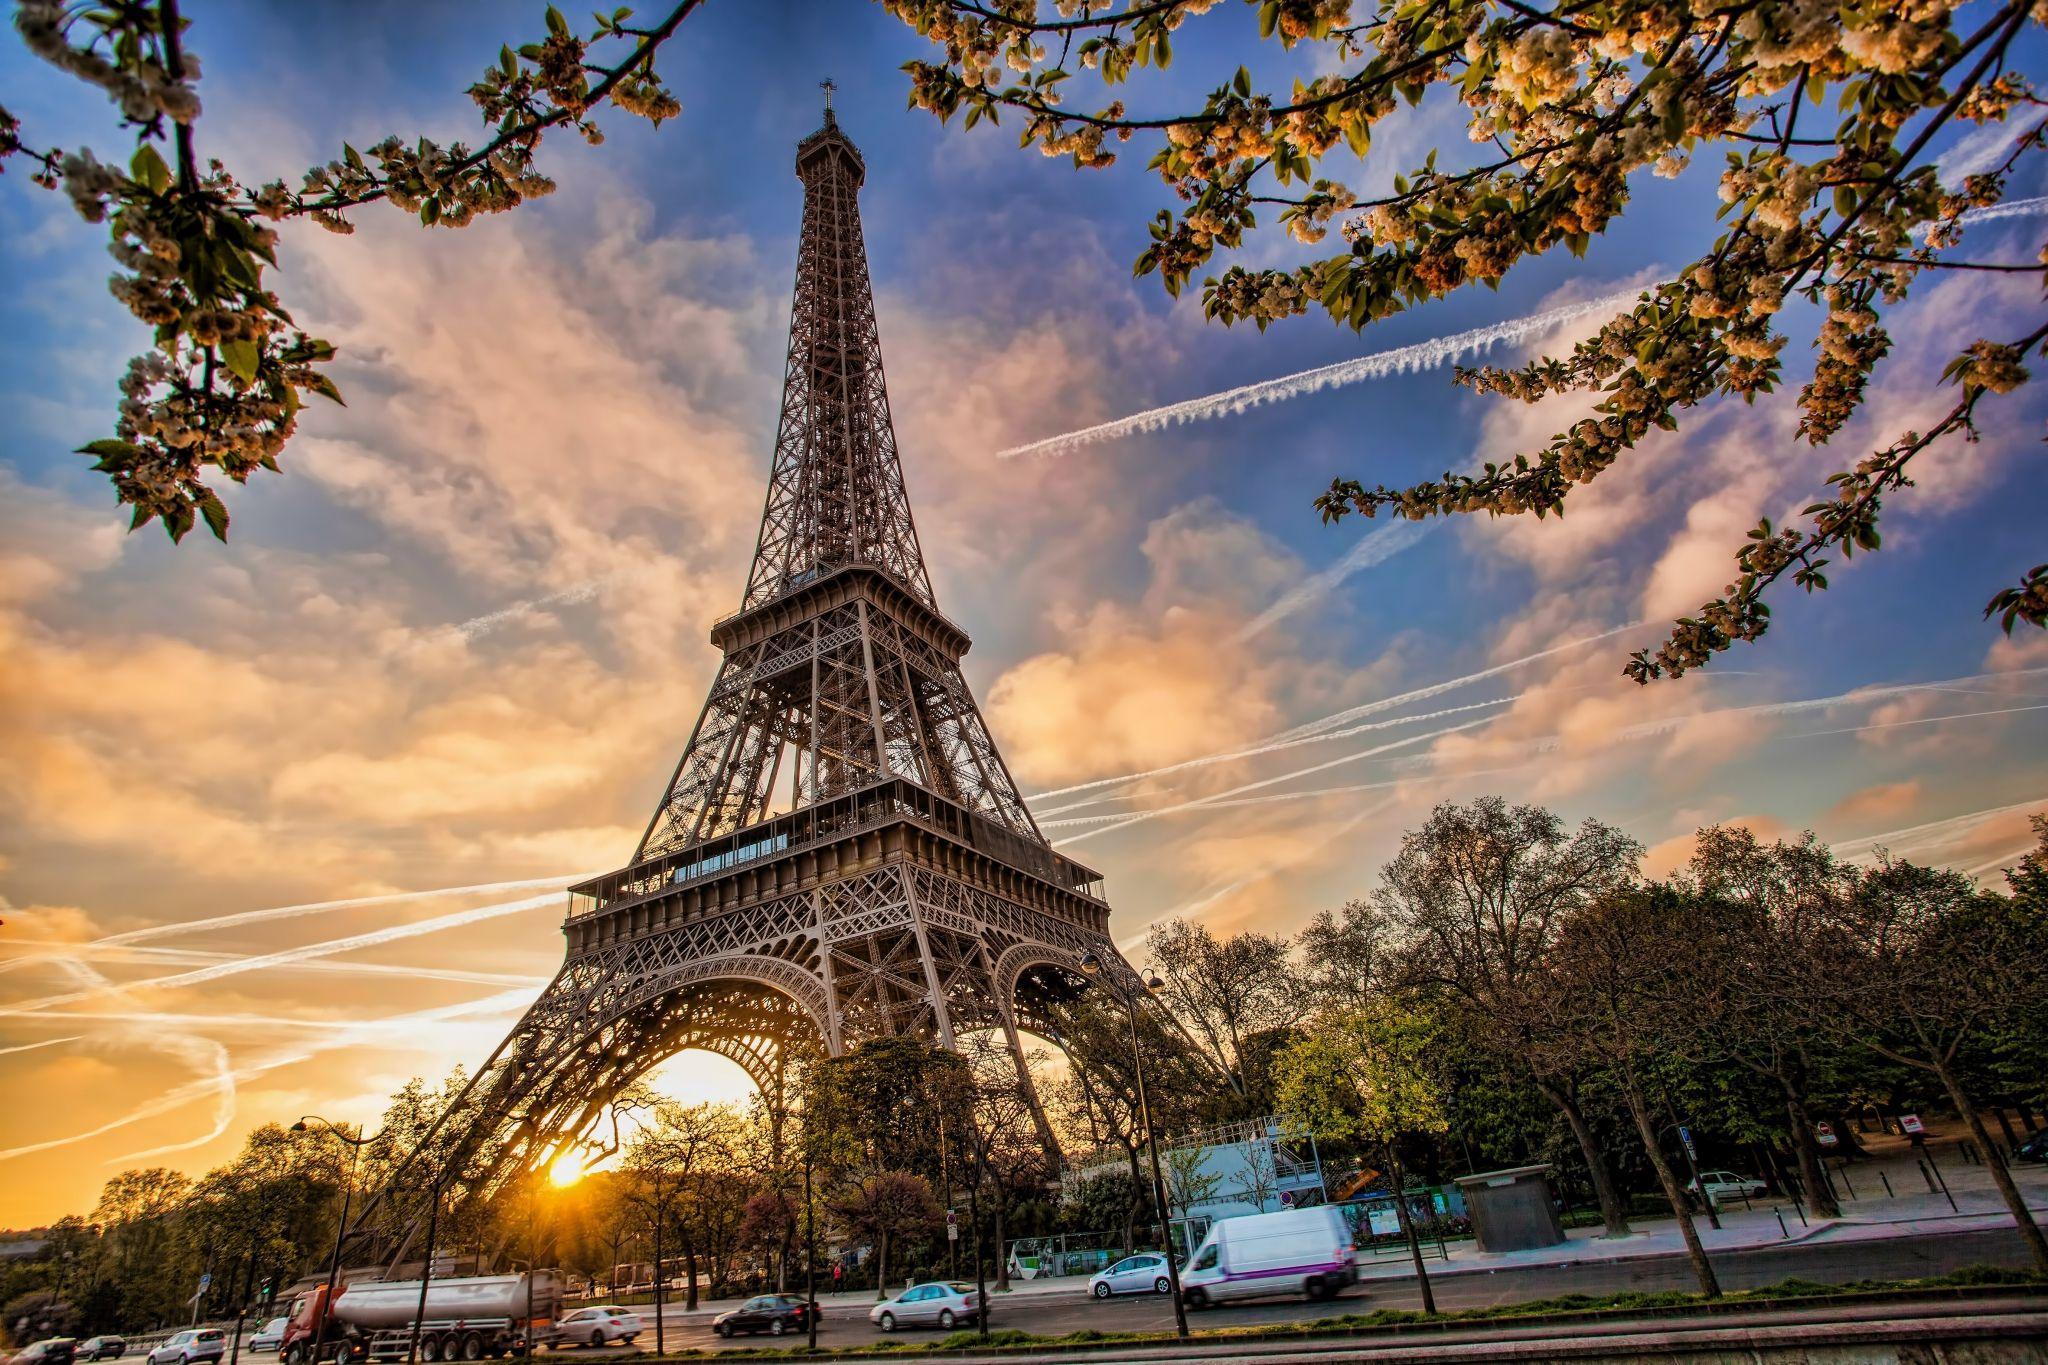 Paris Desktop Wallpapers Top Free Paris Desktop Backgrounds